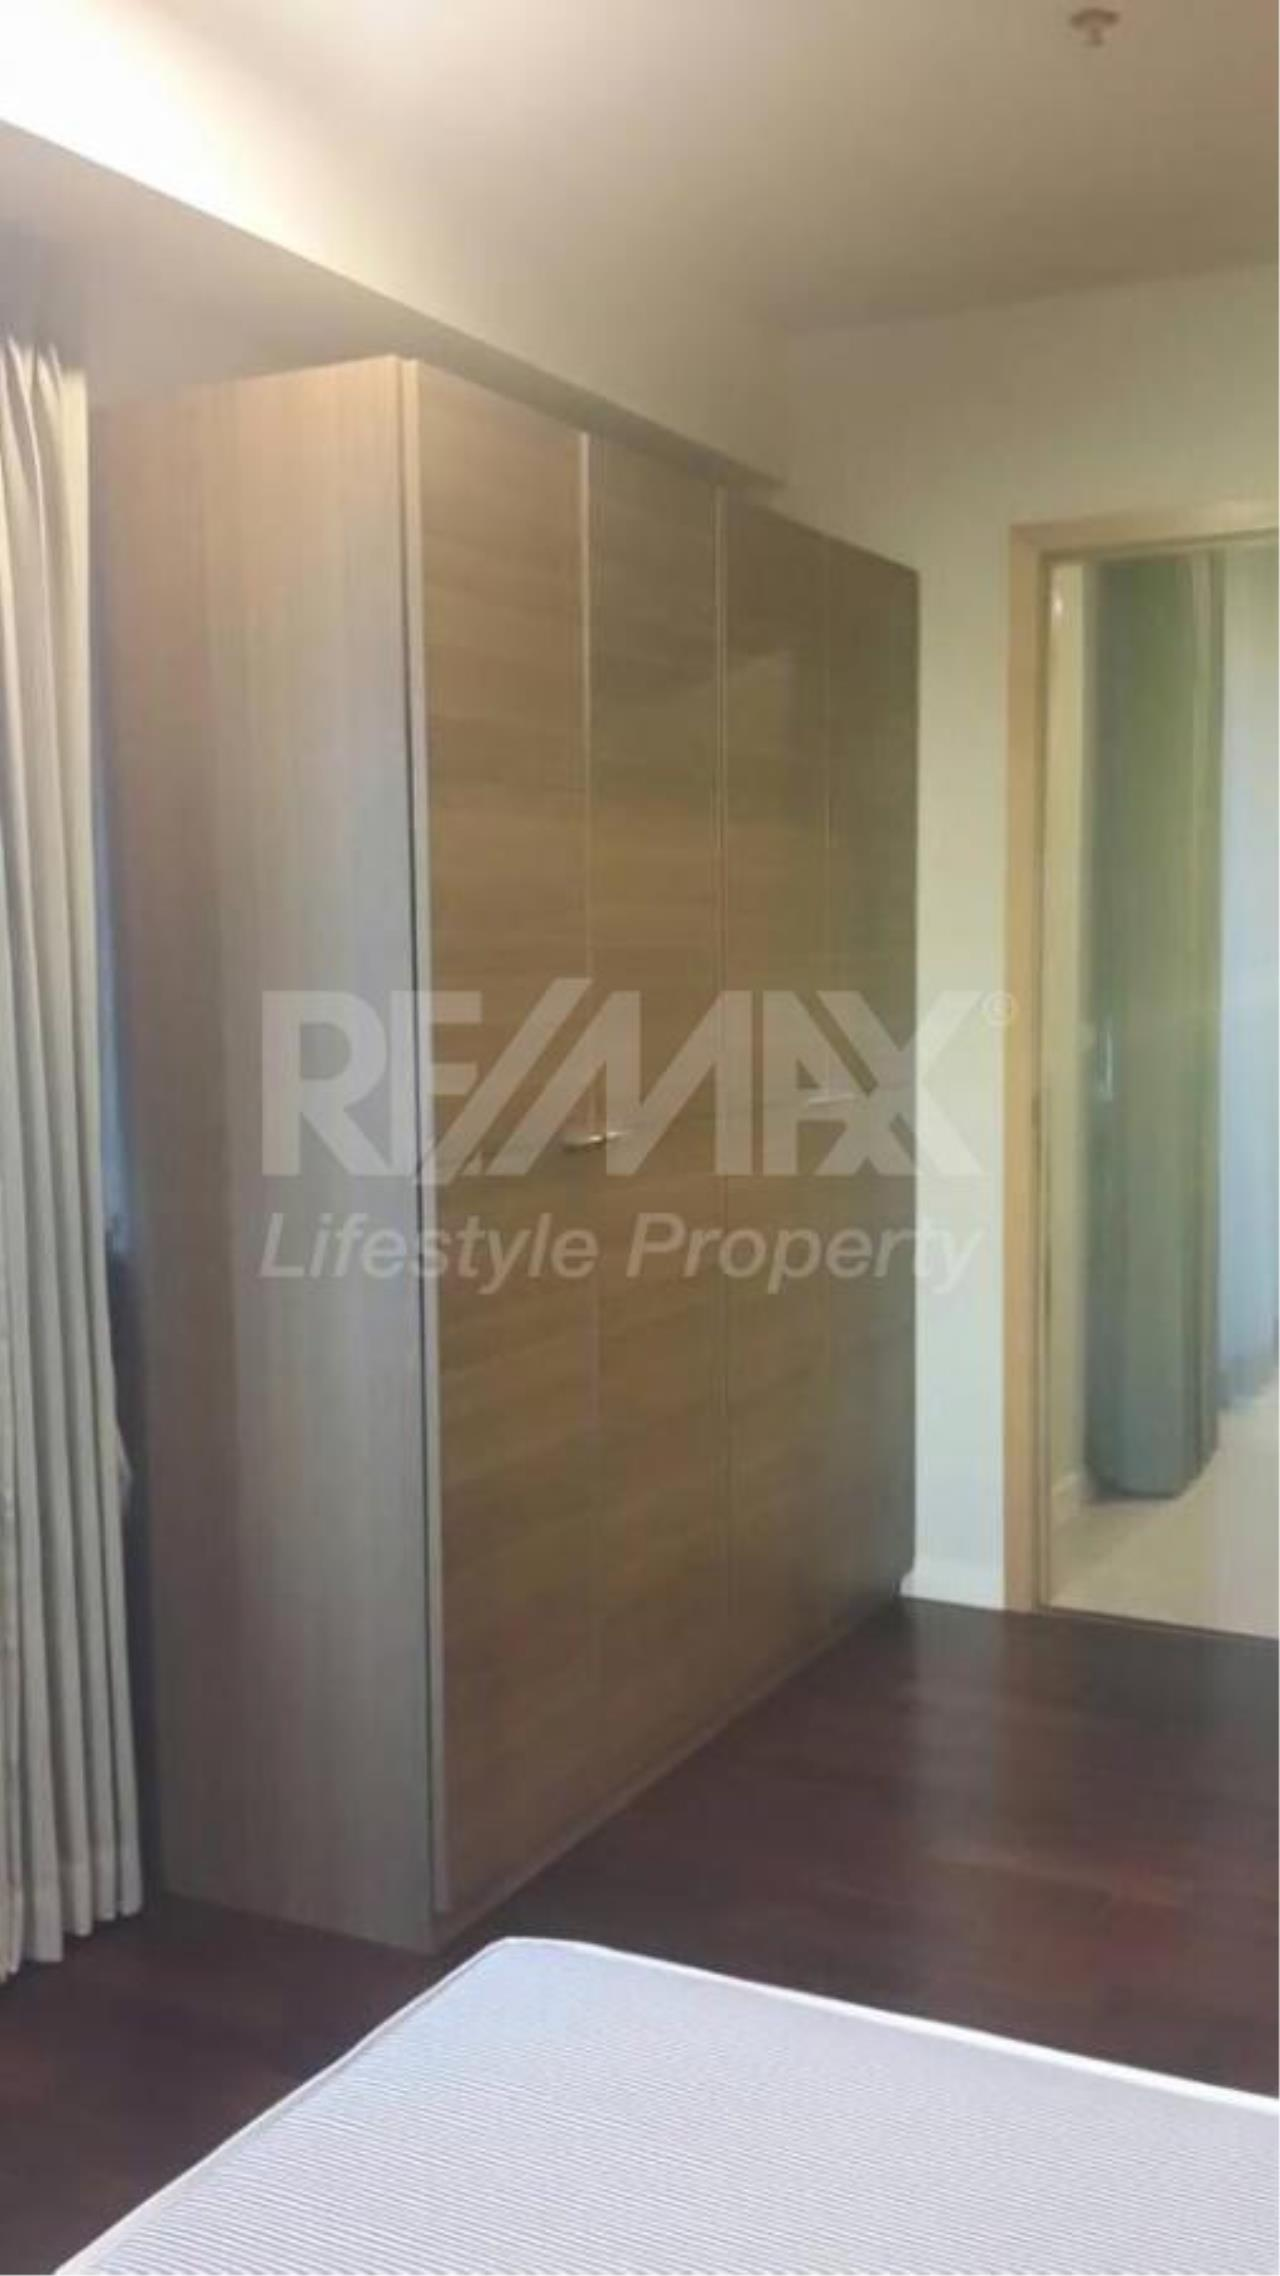 RE/MAX LifeStyle Property Agency's Circle Condominium 4